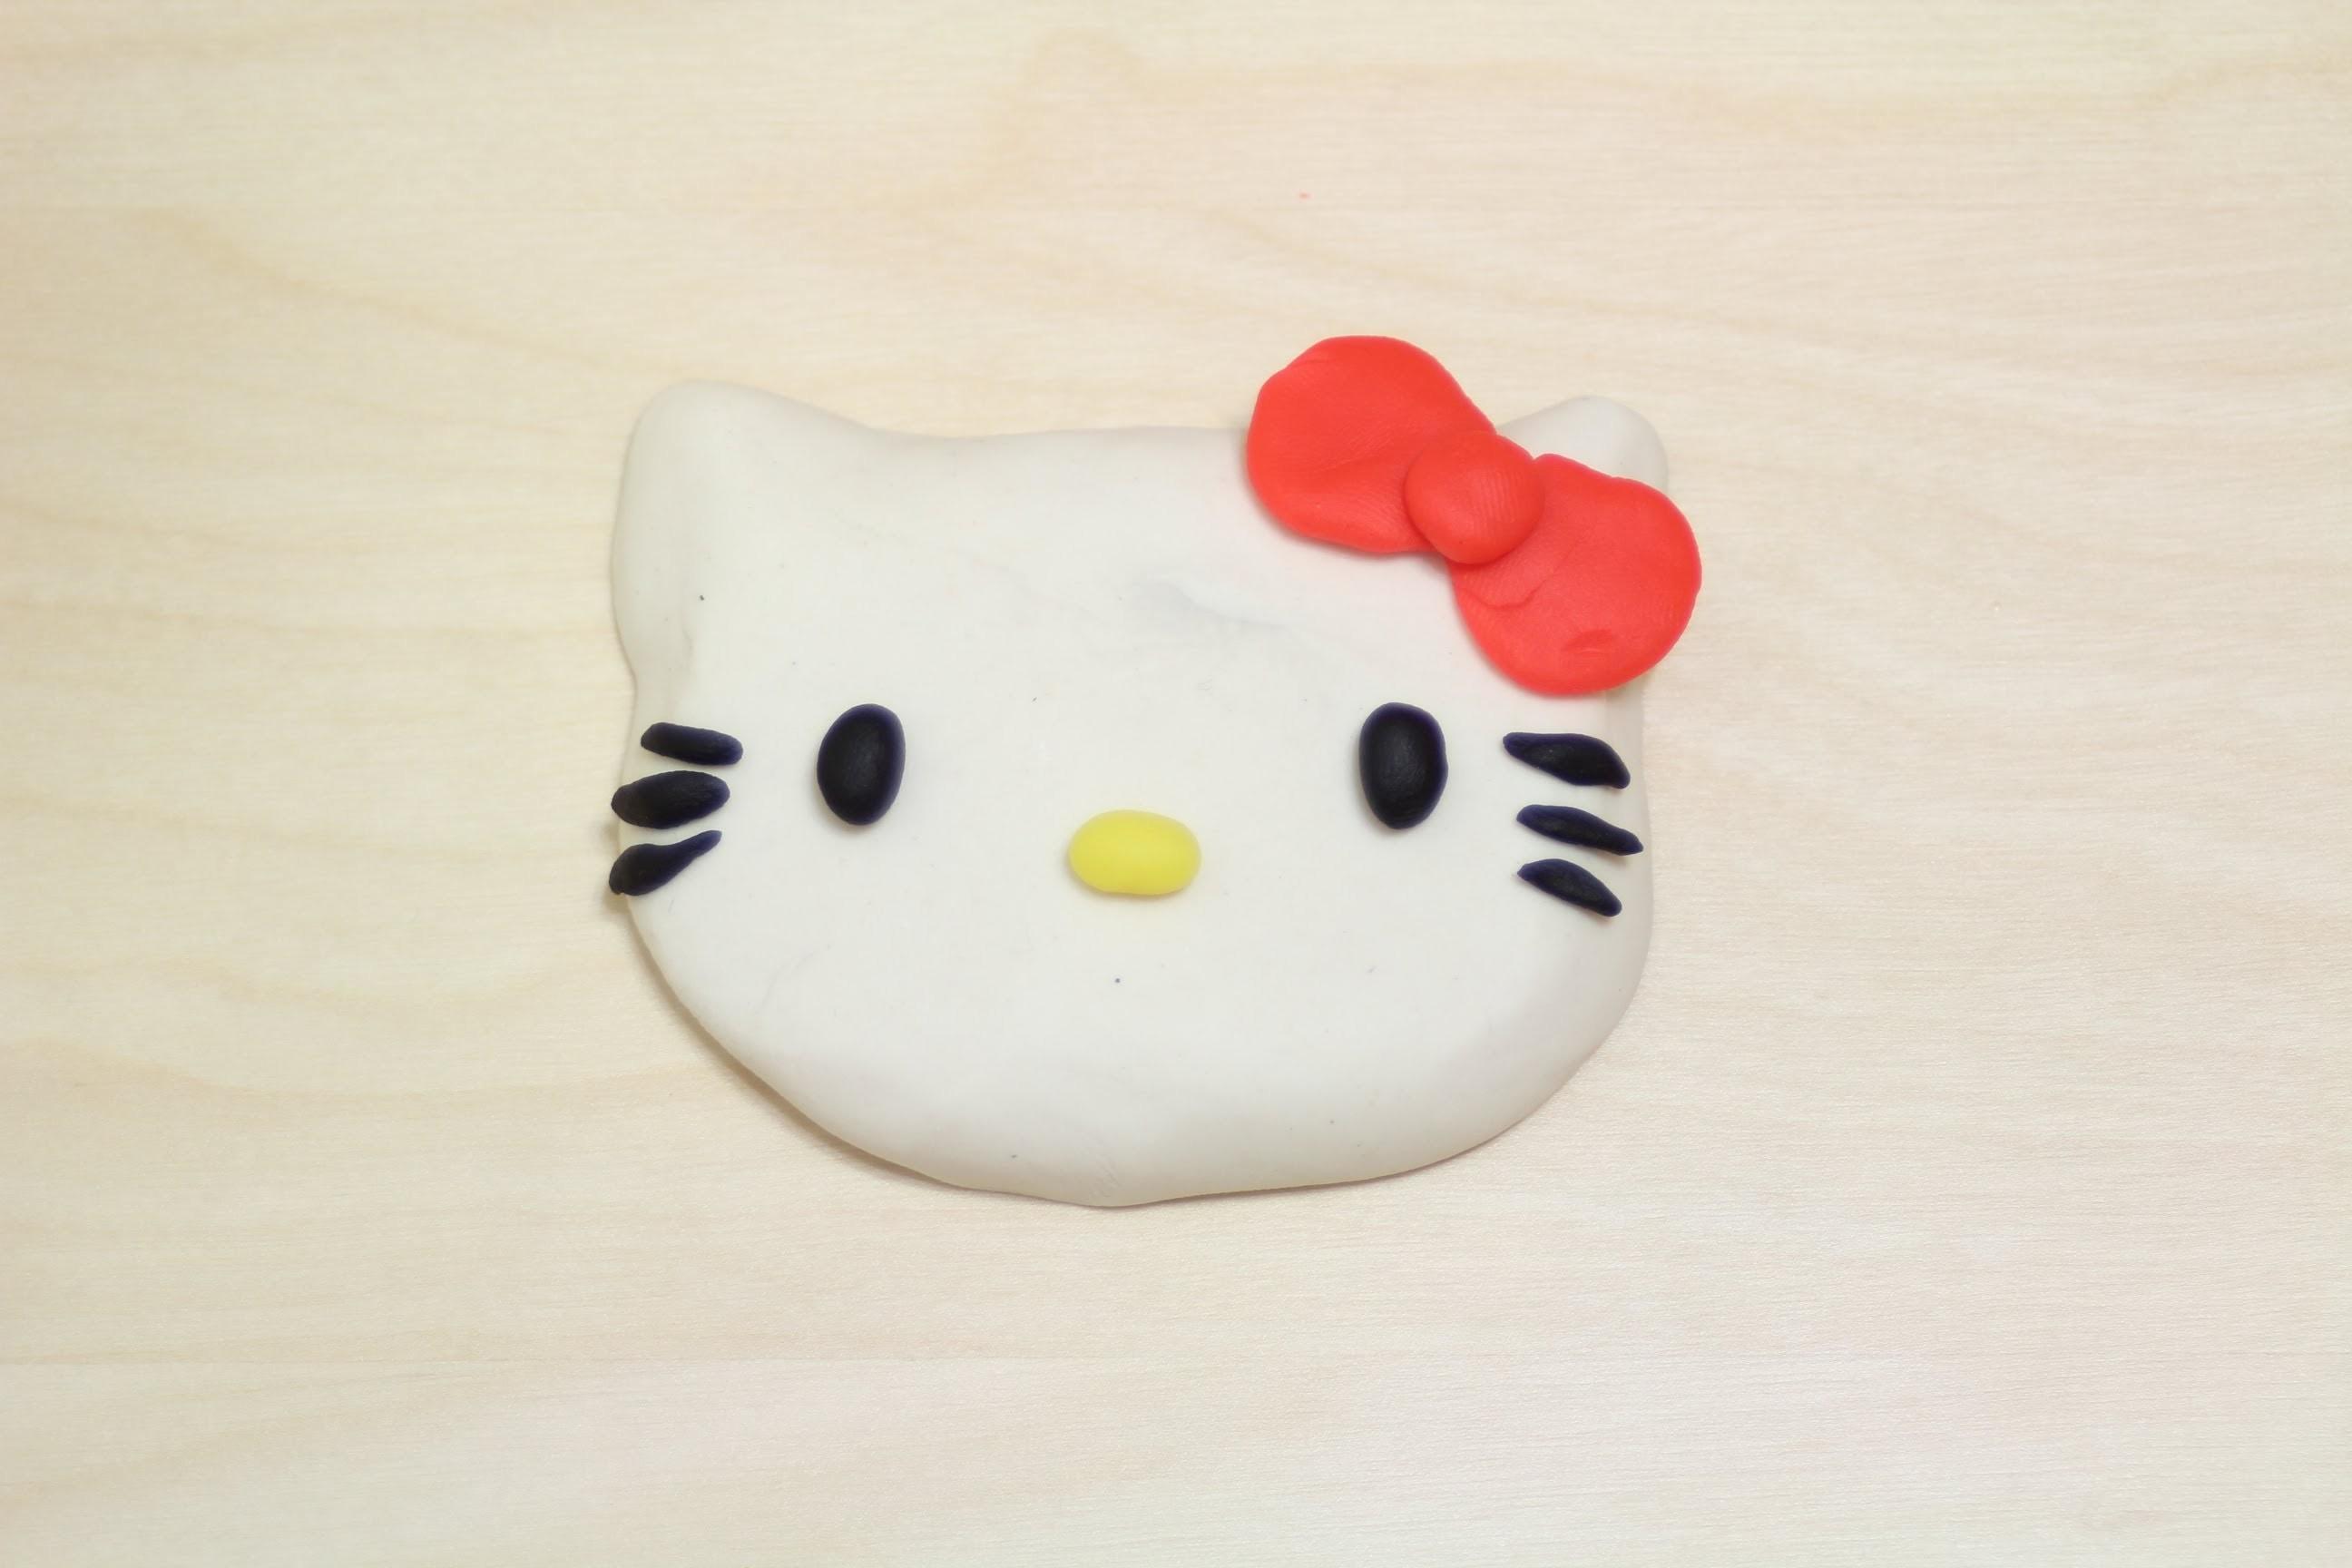 Play-Doh Hello Kitty Easy! How to Make Sanrio Hello Kitty Cake Fun to Make